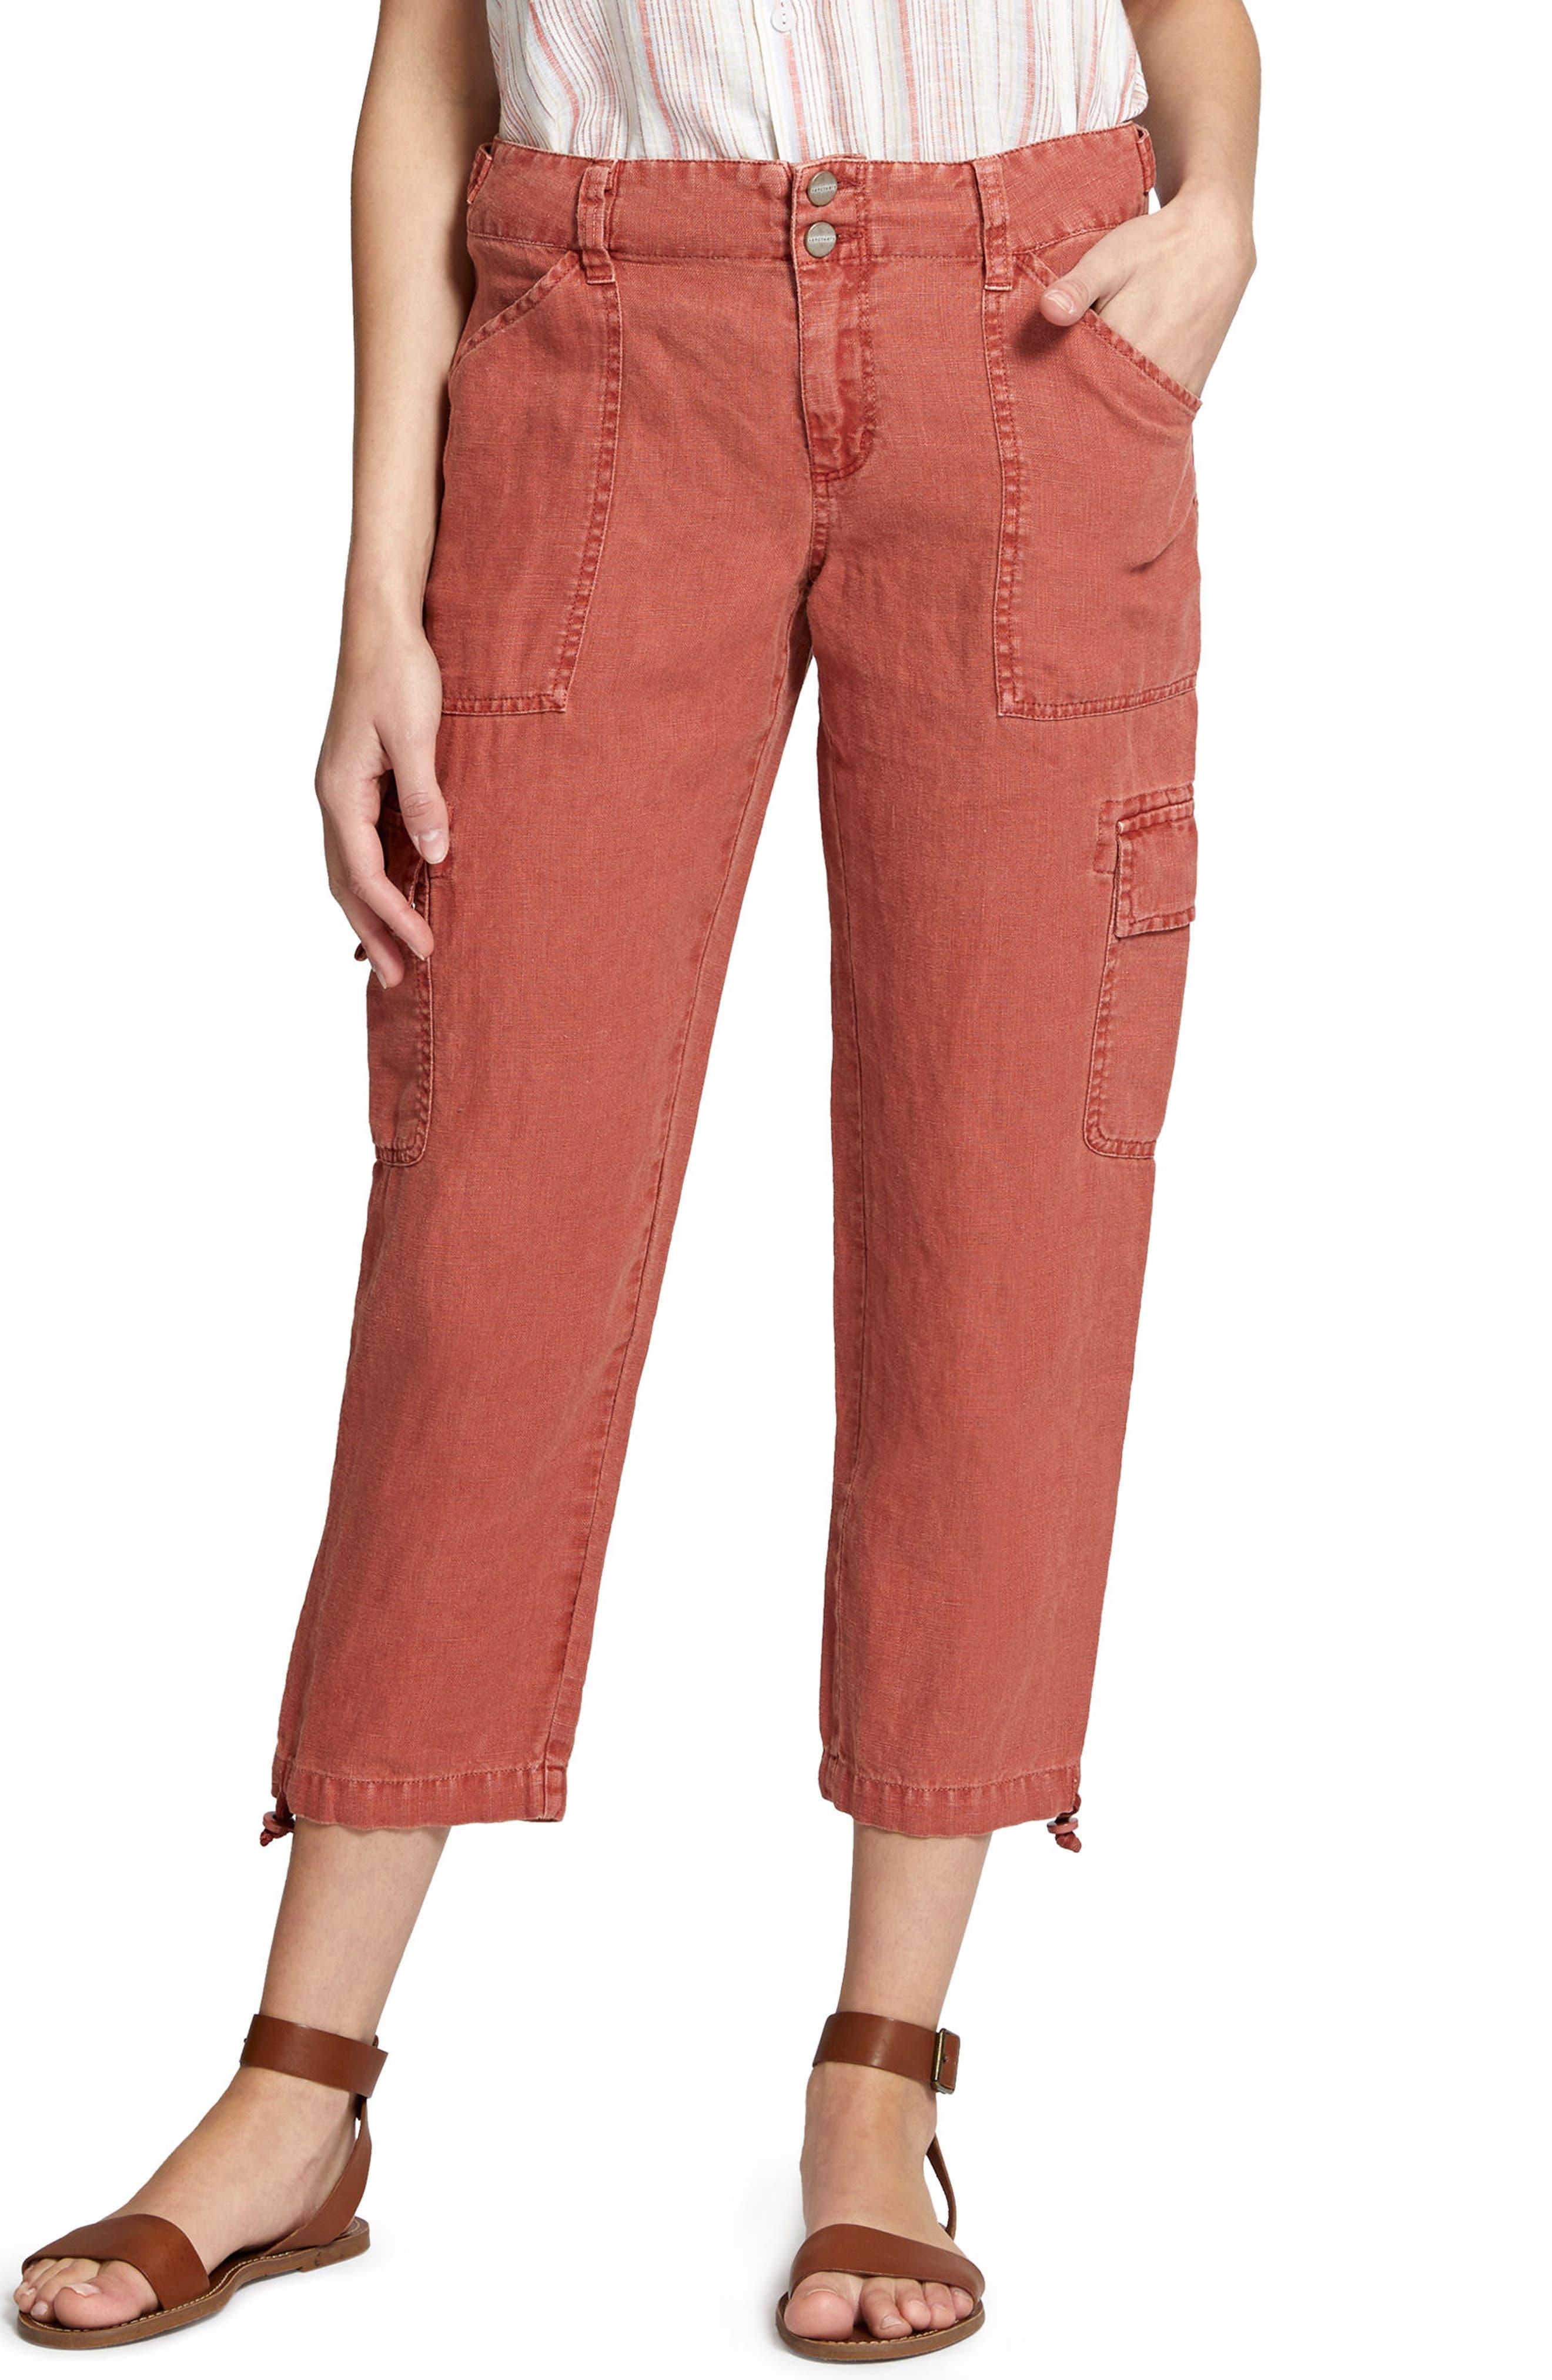 Terrain Linen Crop Cargo Pants,                             Main thumbnail 1, color,                             Terra Cotta